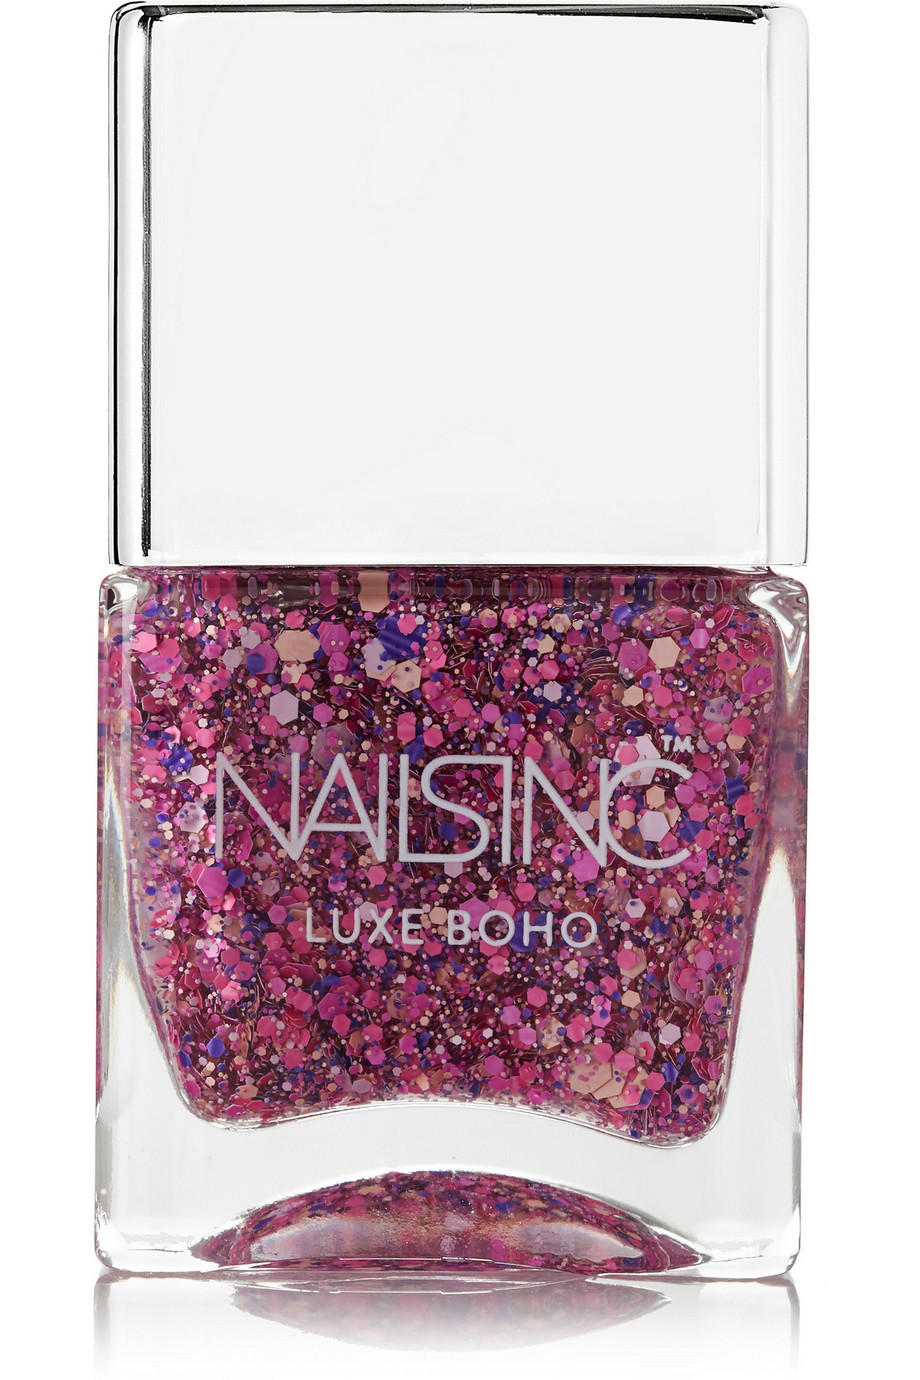 Luxe Boho Nail Polish - Notting Hill Lane, by Nails inc